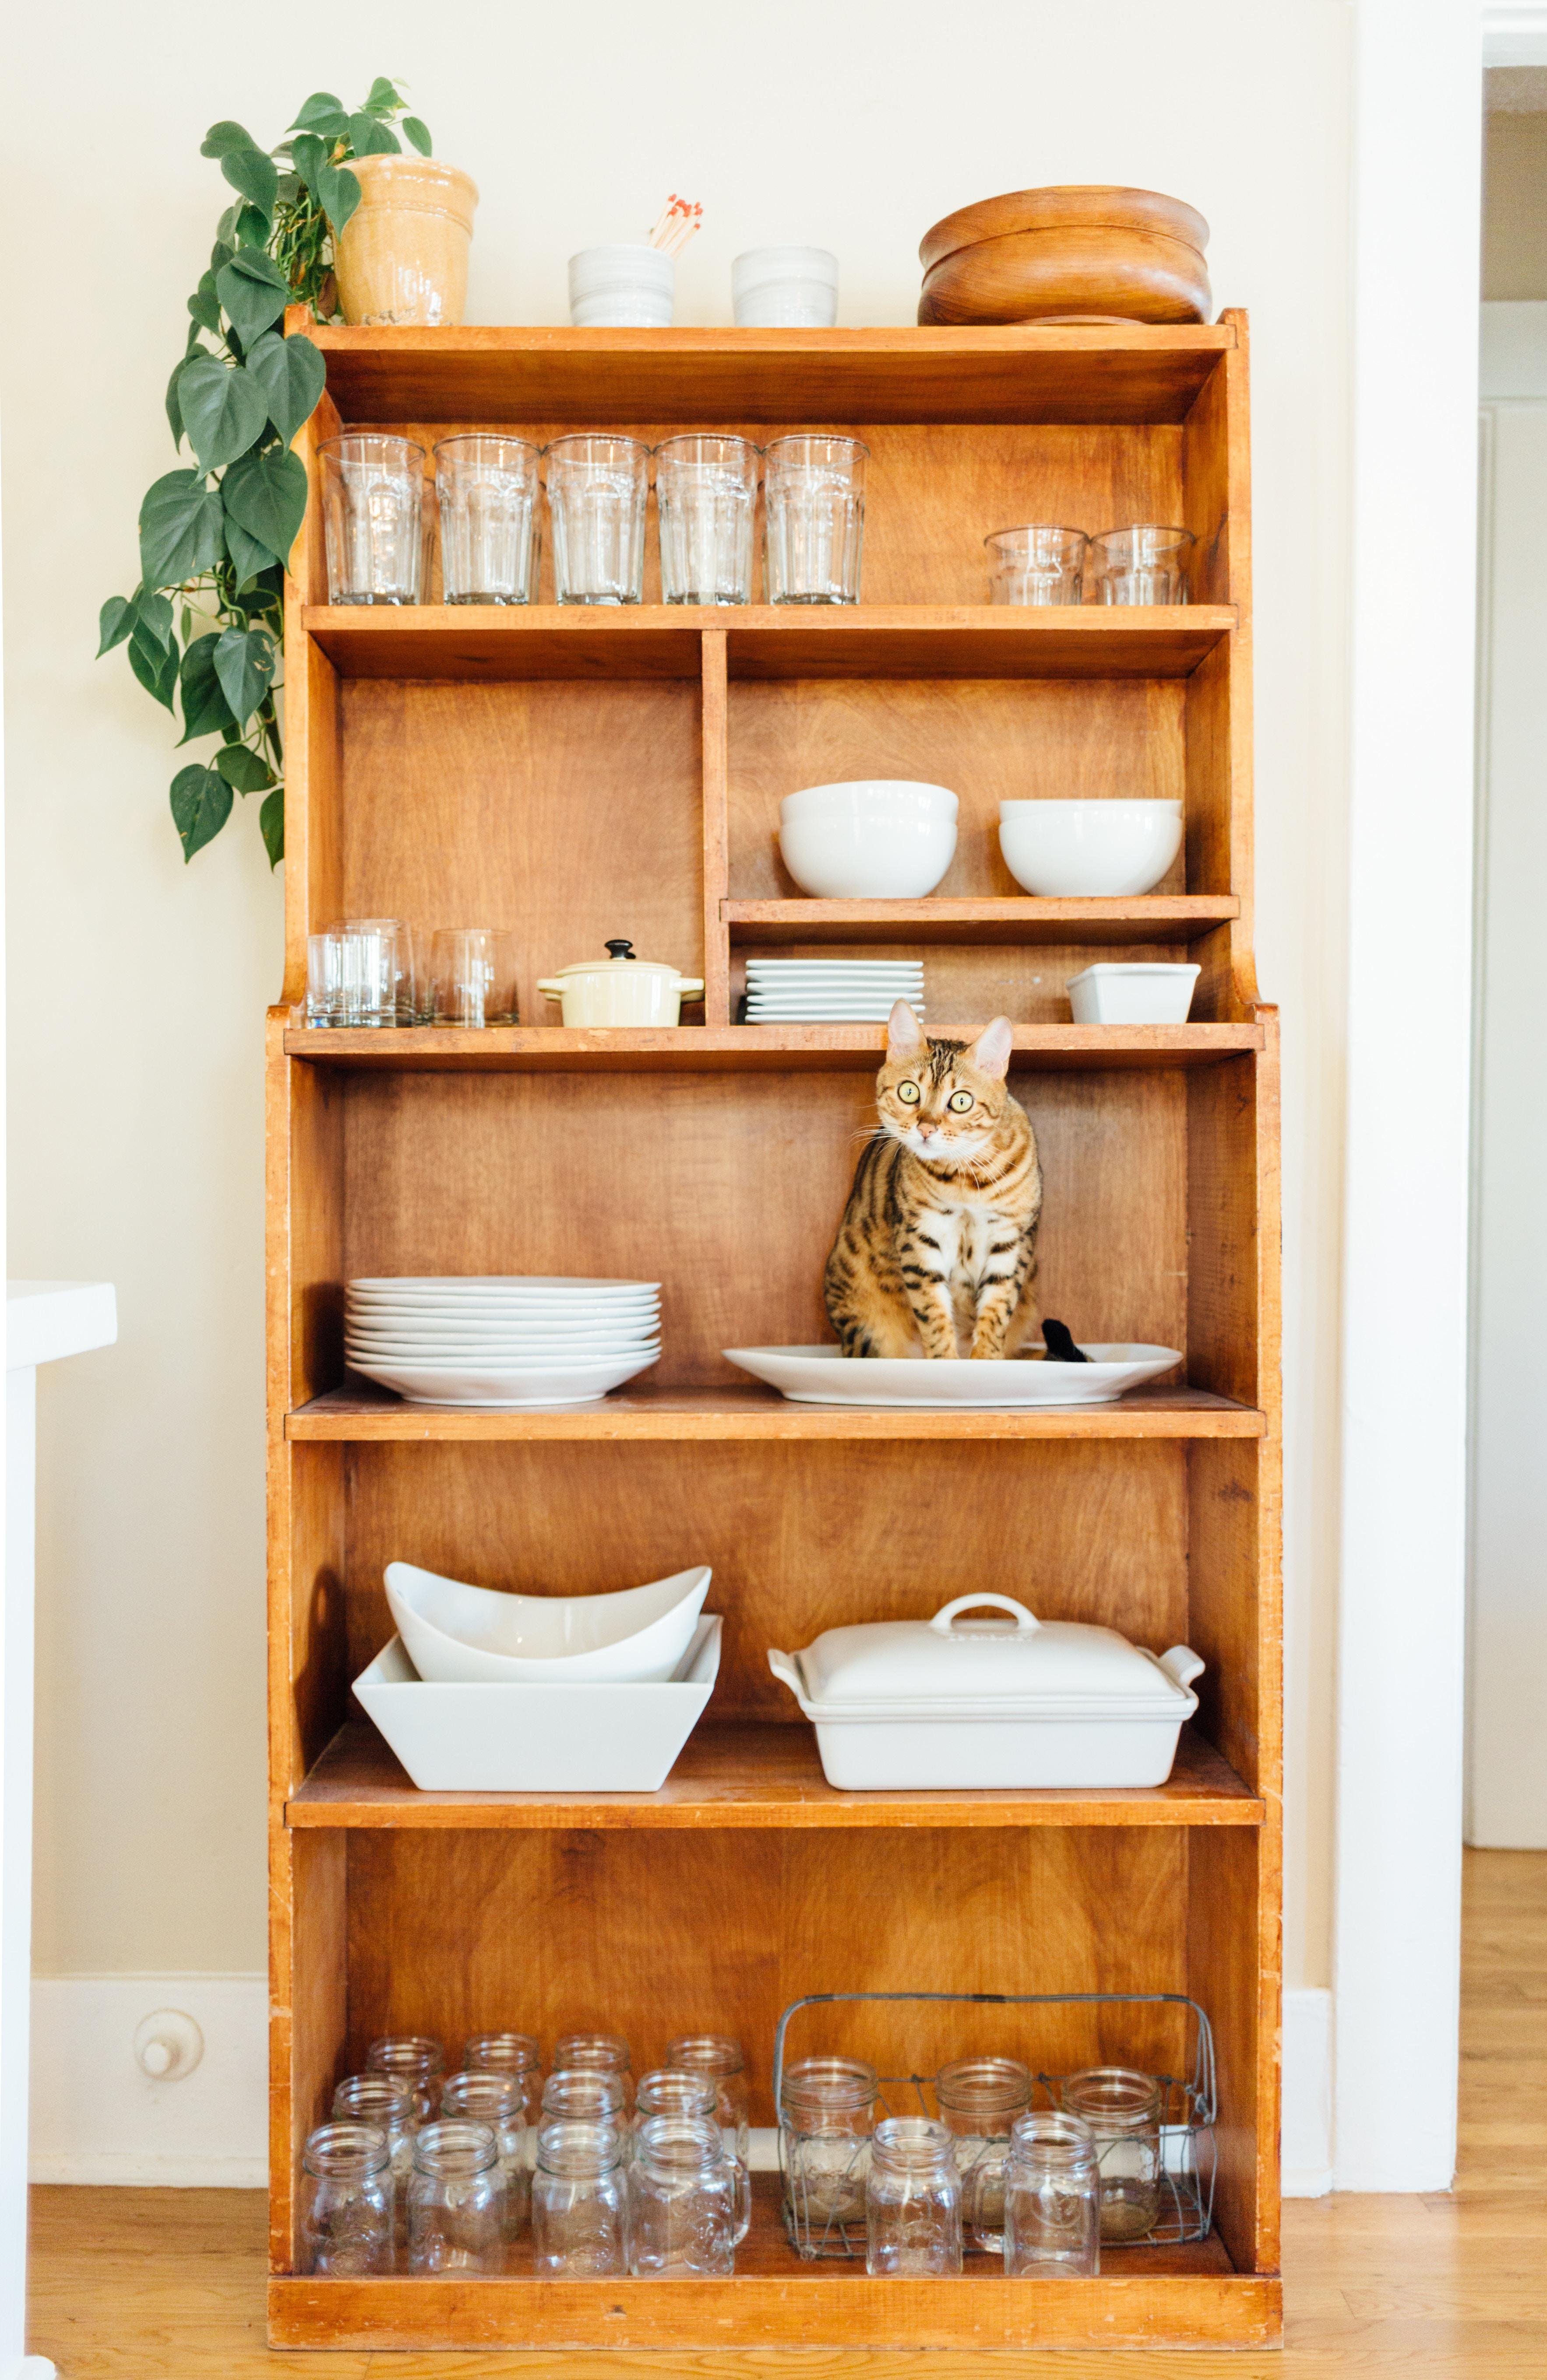 Organize Home Basics